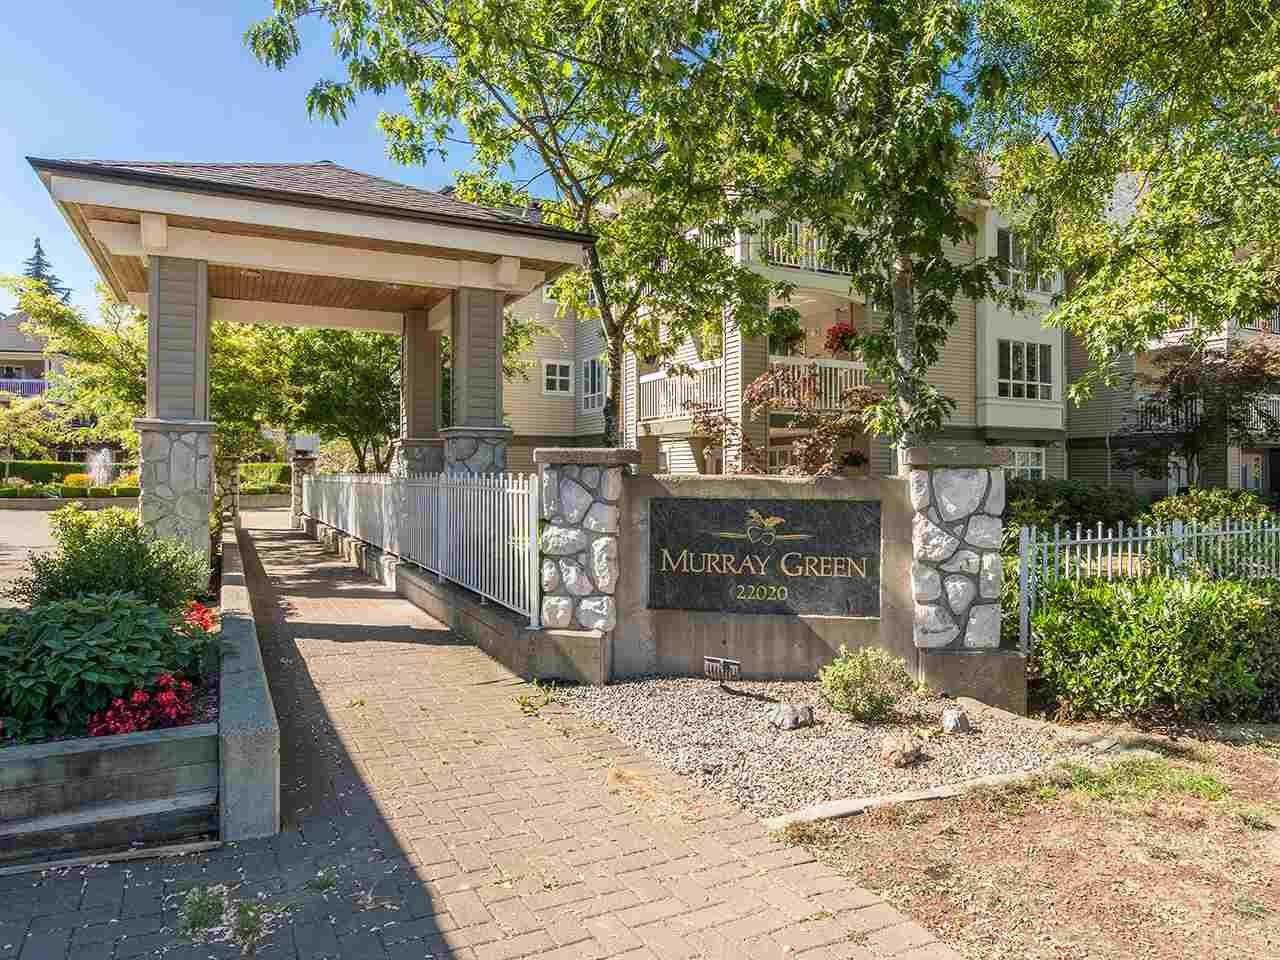 R2100782 - 128 22020 49 STREET, Murrayville, Langley, BC - Apartment Unit